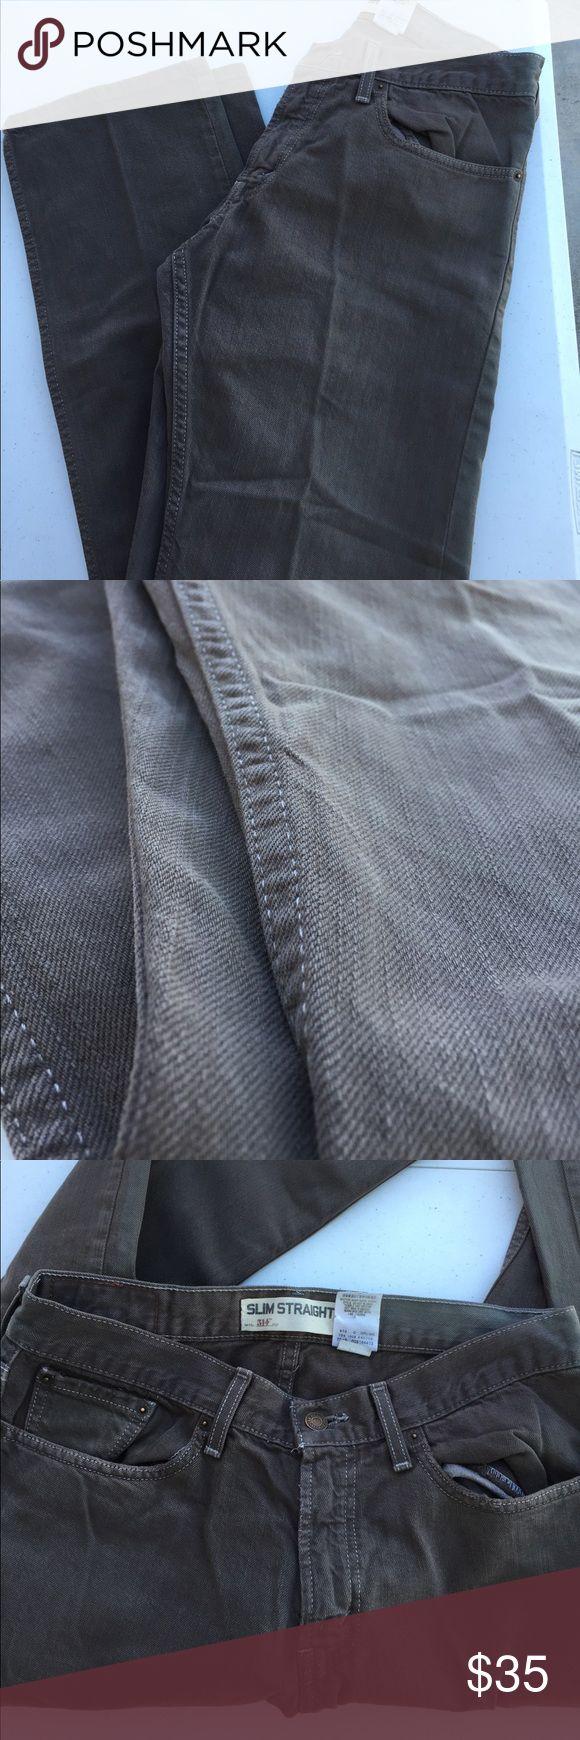 Men's LEVI 514 Slim Straight Jeans 32/32 Men's LEVI 514 Slim Straight Jeans 32/32 stone colored wash. Very good condition. Gently used. Levi's Jeans Slim Straight